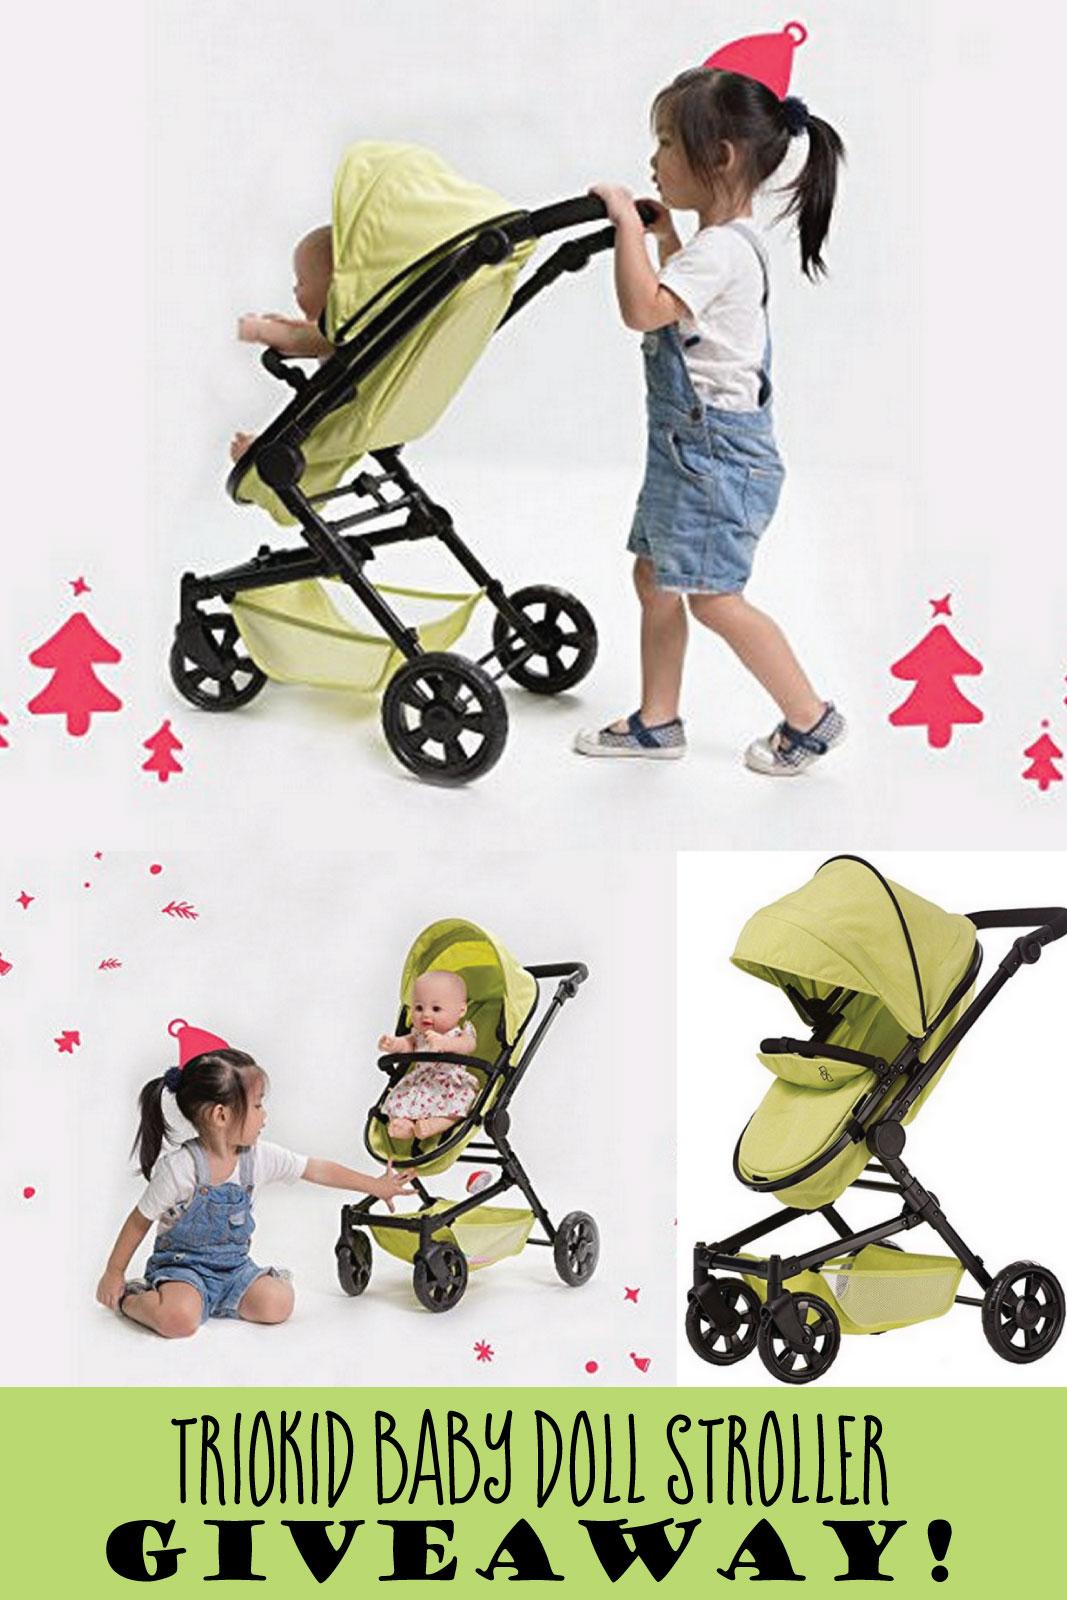 triokid-baby-doll-stroller-giveaway